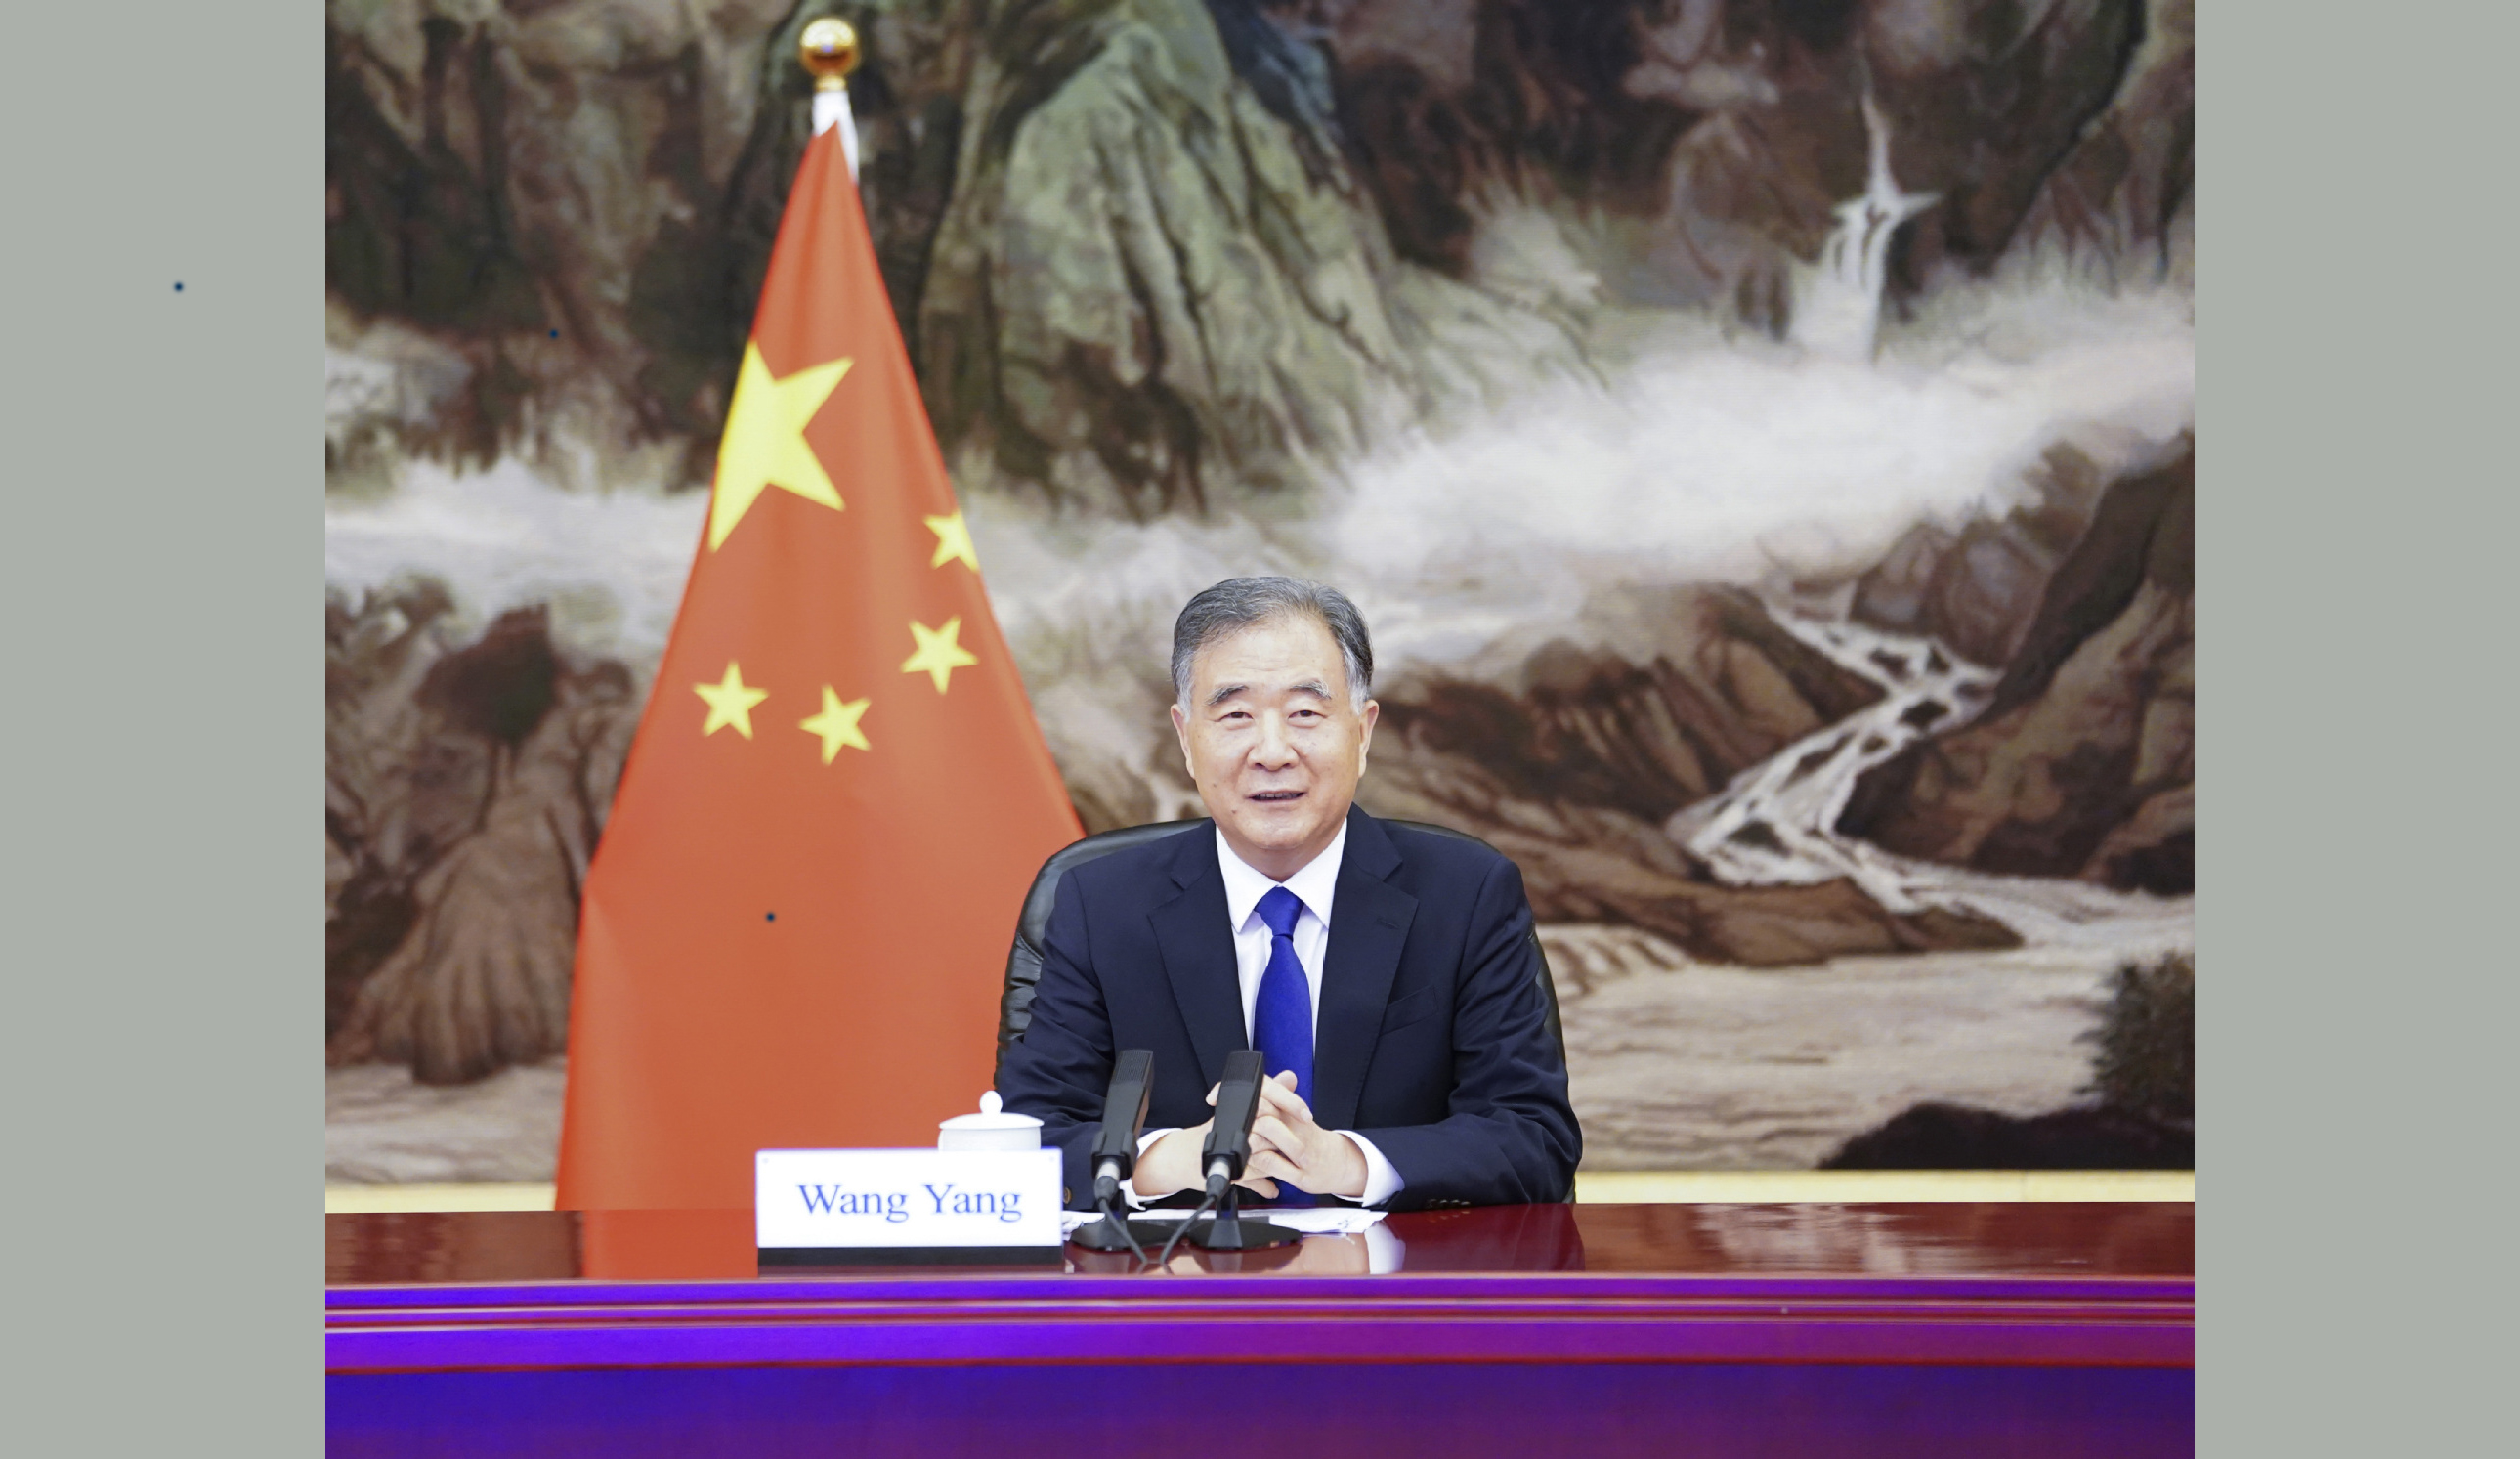 Wang Yang pledges enhanced China-Laos relations